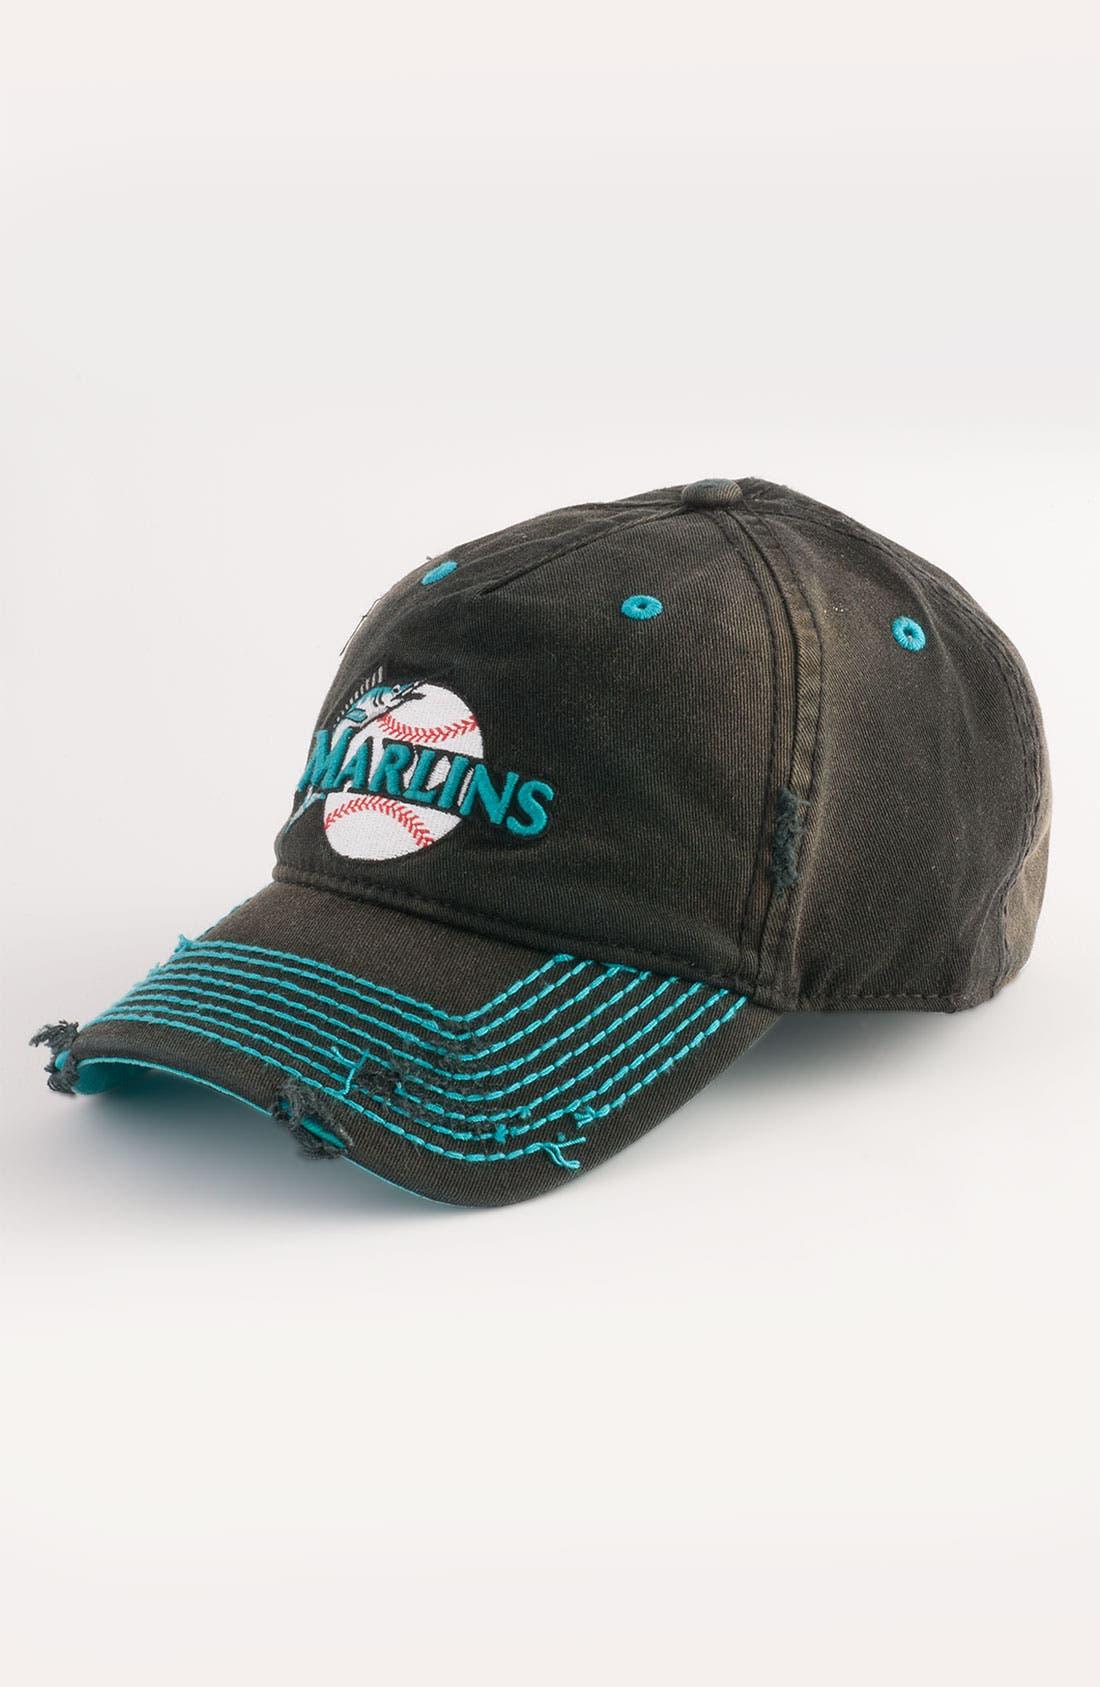 Main Image - American Needle 'Marlins' Baseball Cap